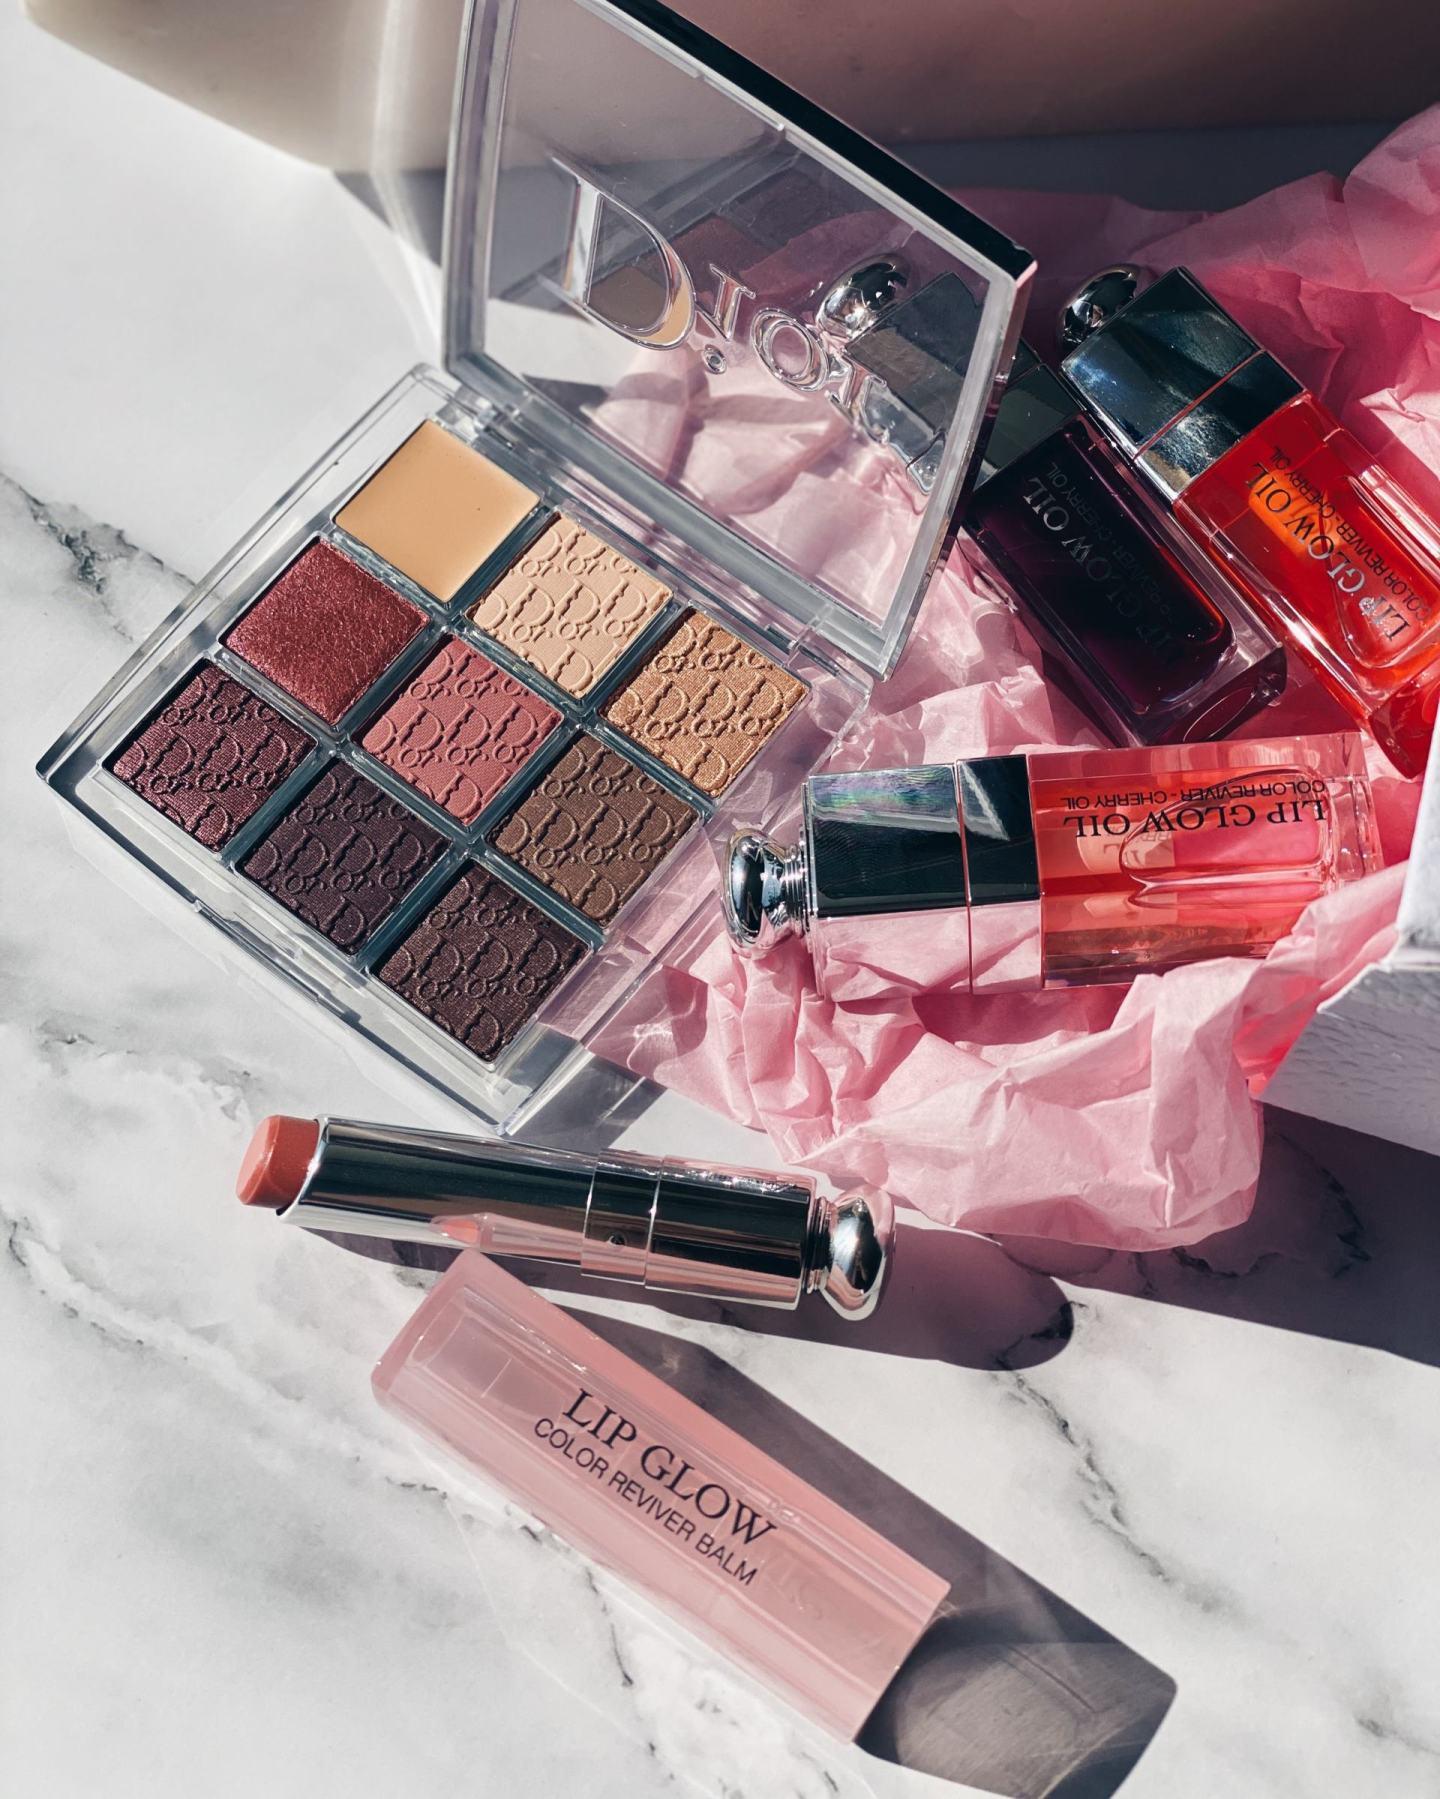 Dior Backstage Rosewood Neutrals Palette